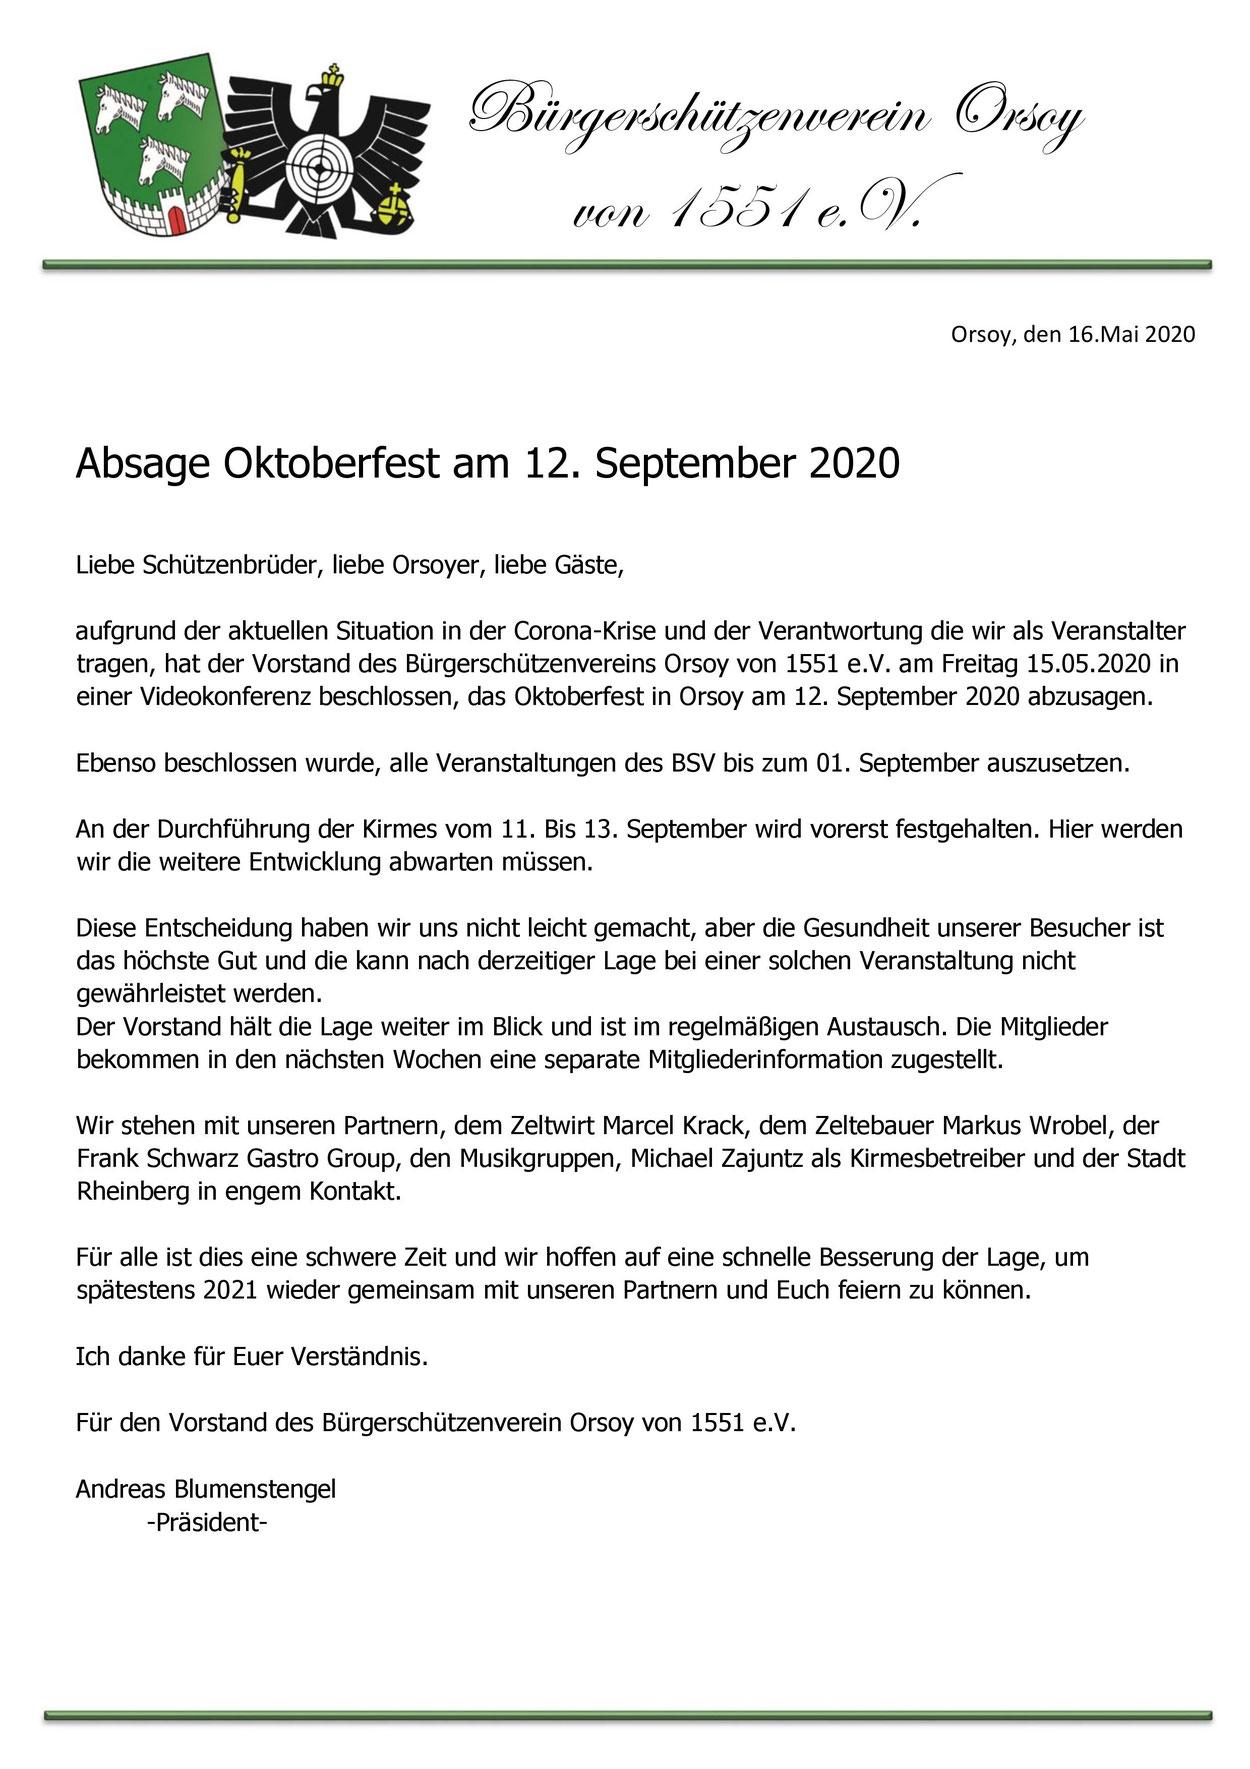 Absage Oktoberfest 2020